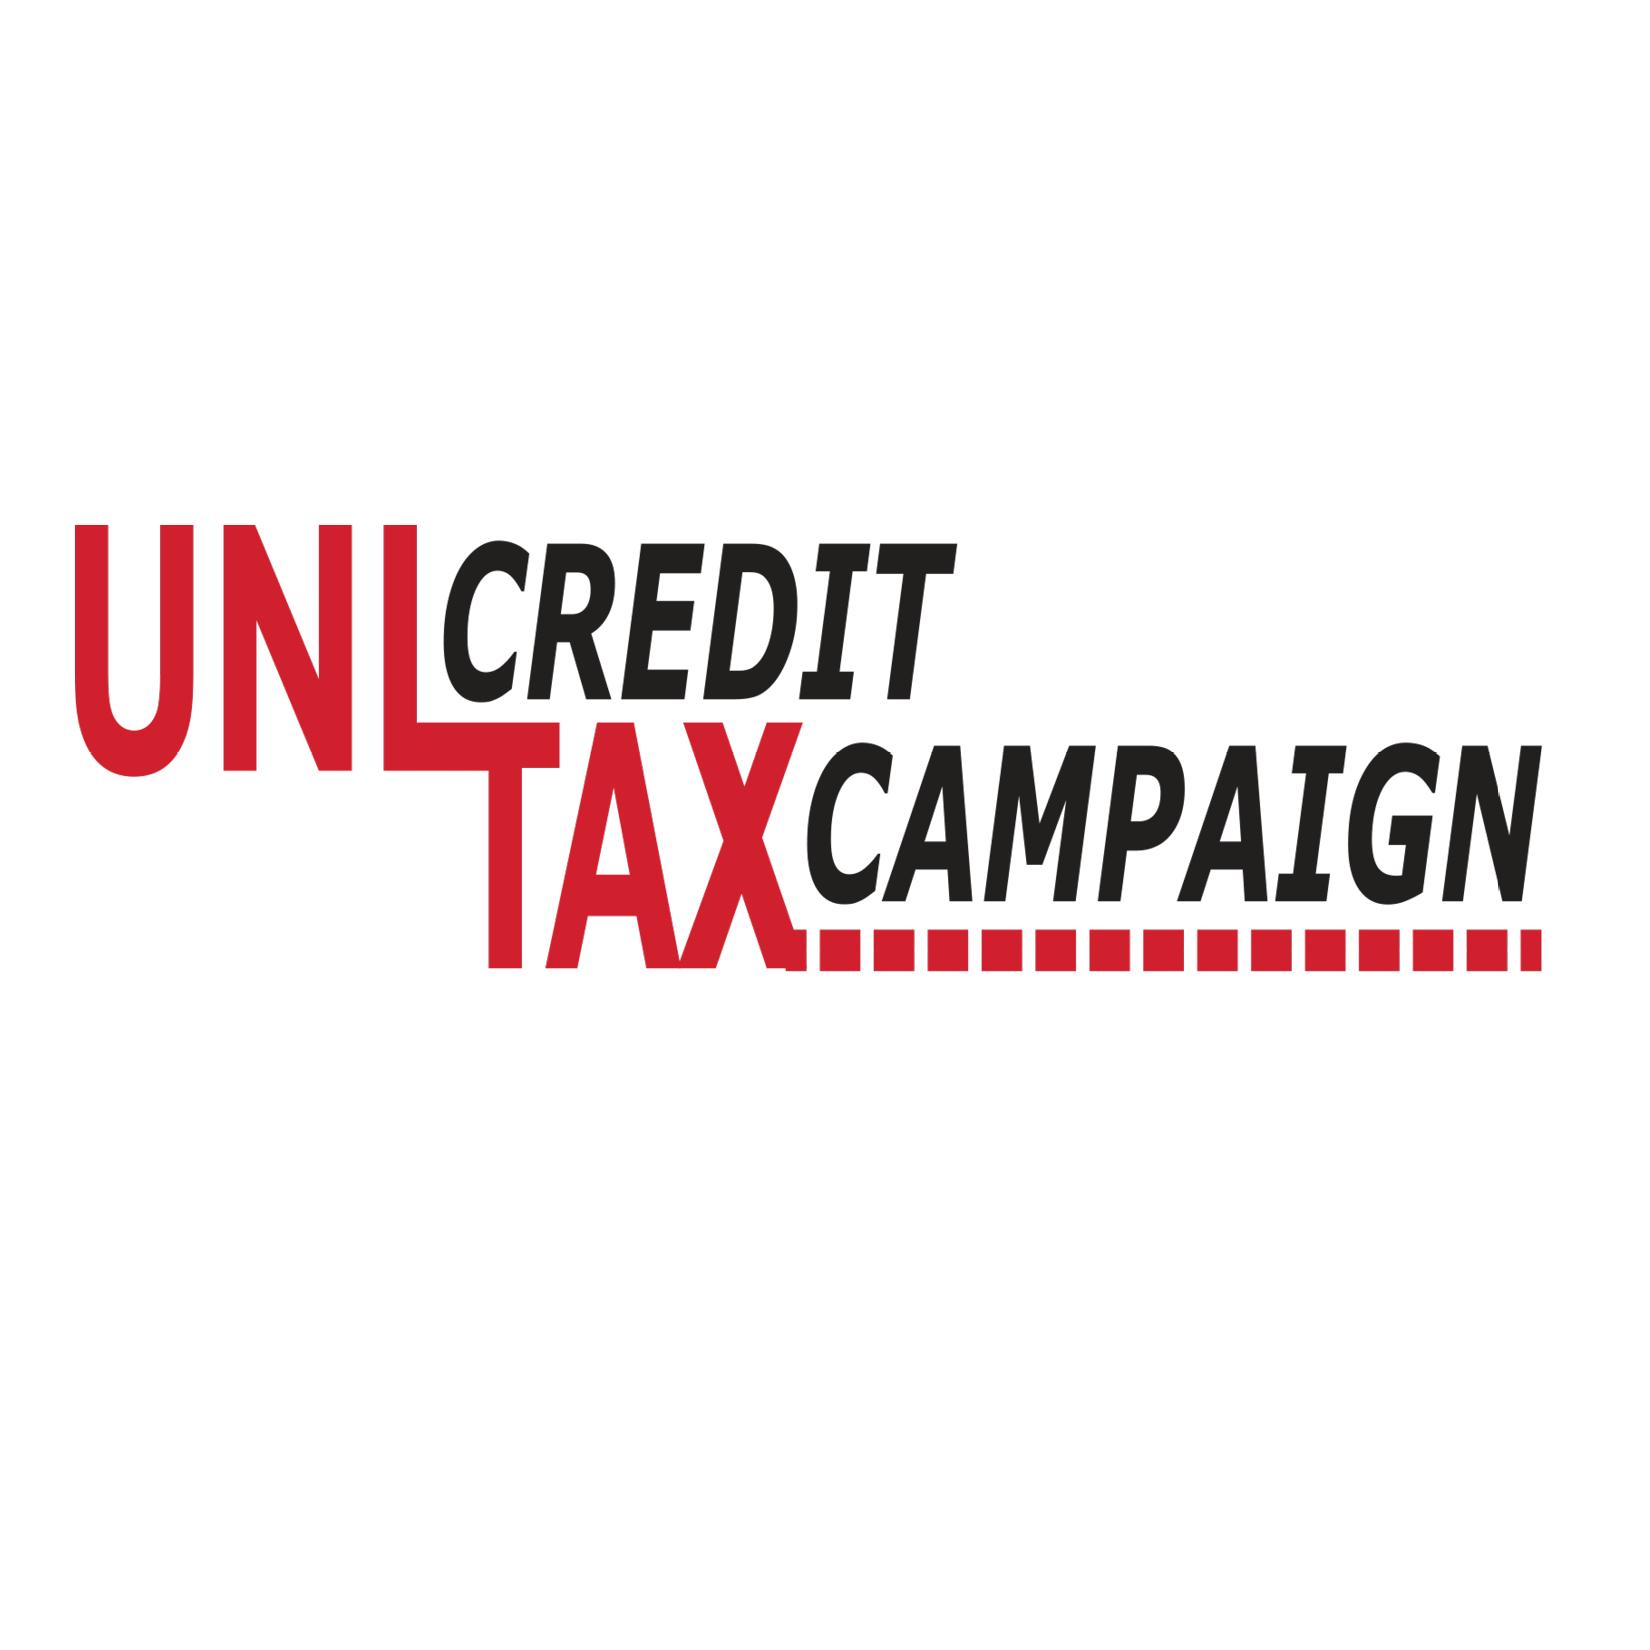 UNL Credit Tax Campaign